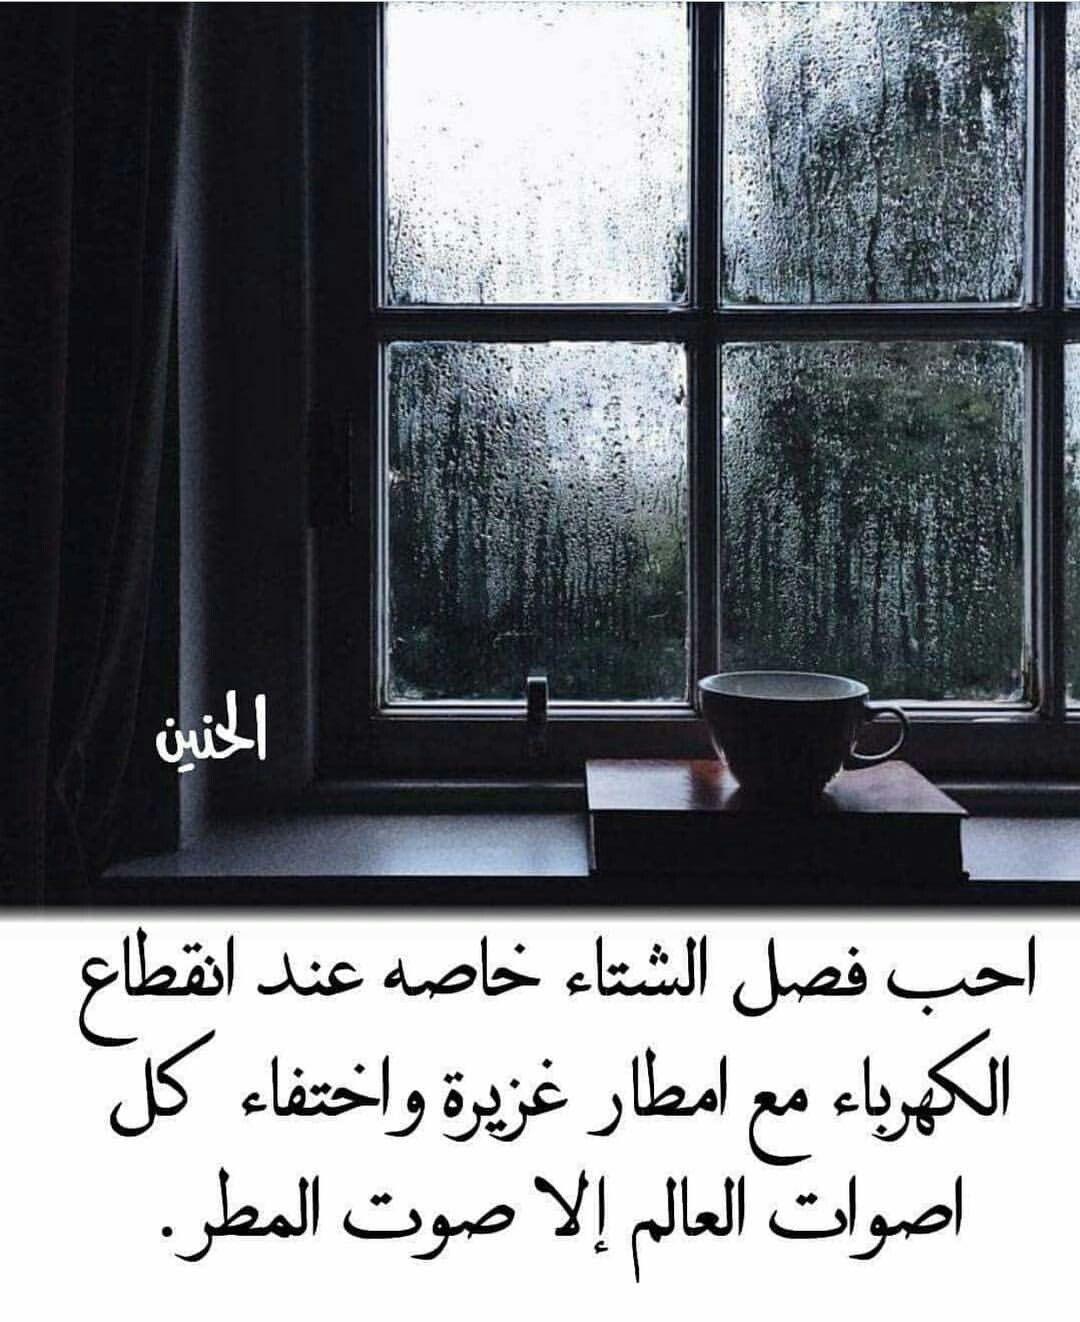 Pin By D Kagura On كلمات Arabic Words Words Windows